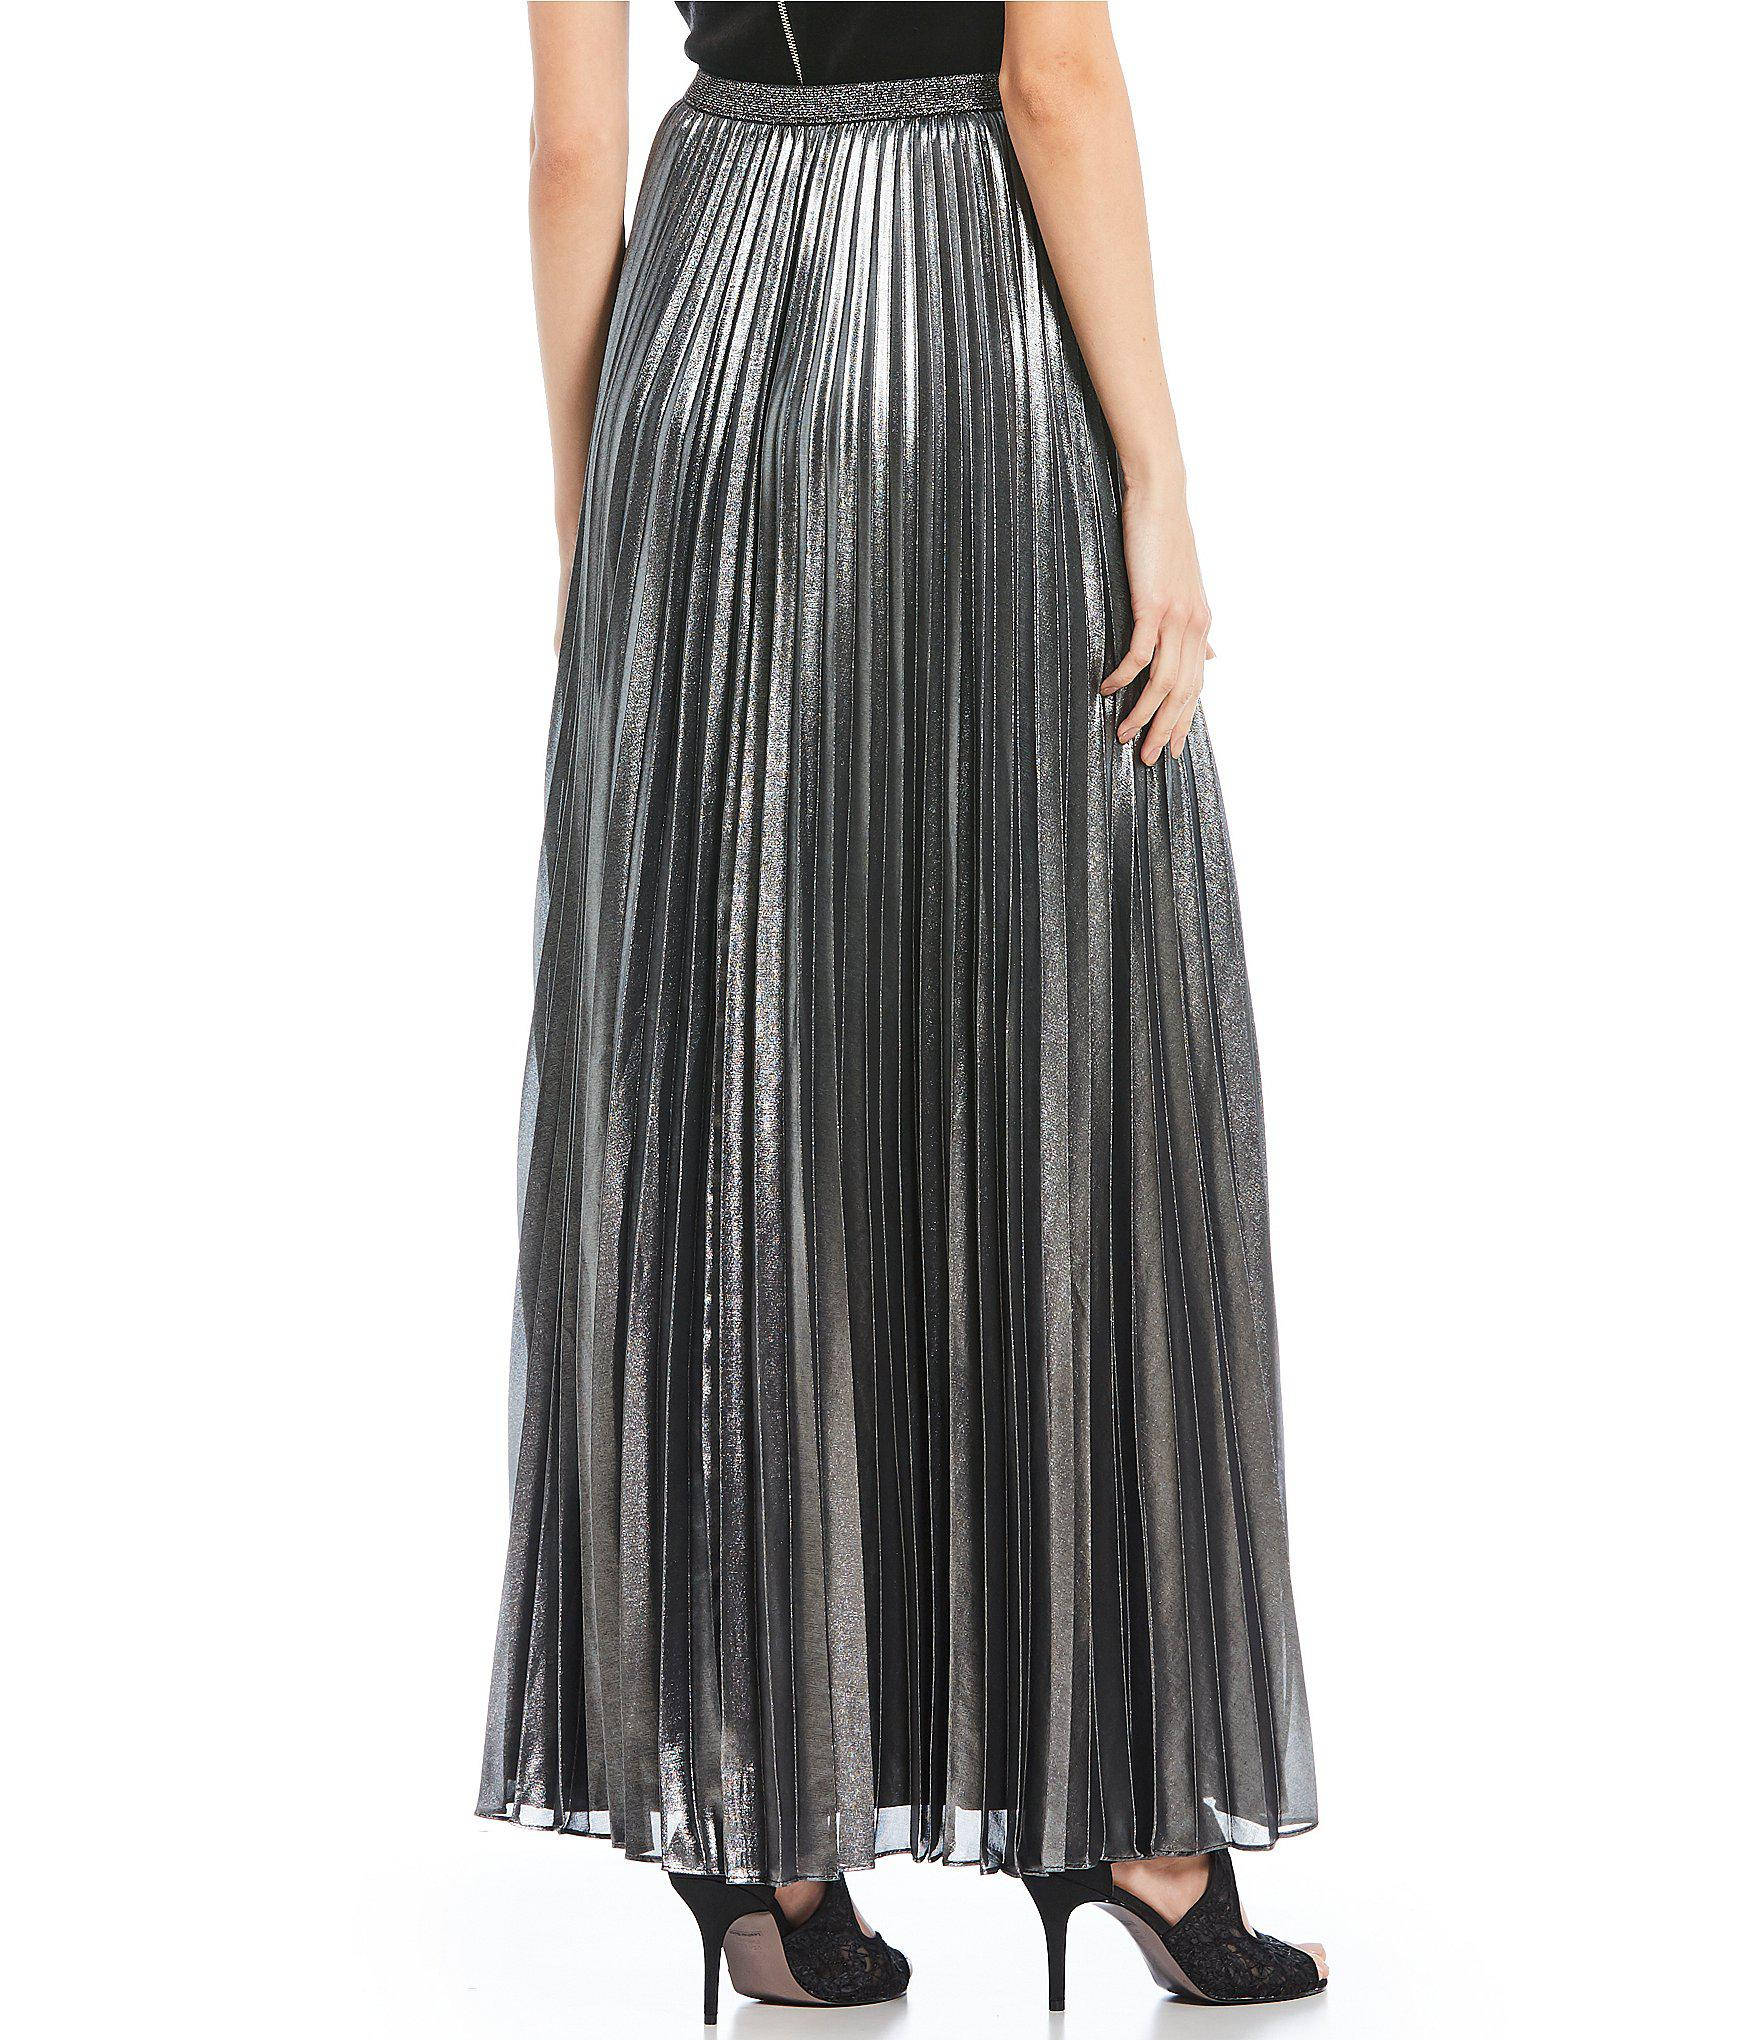 6d0f6684ea1e0 Eliza J - Accordion Pleated Metallic Maxi Skirt - Lyst. View fullscreen